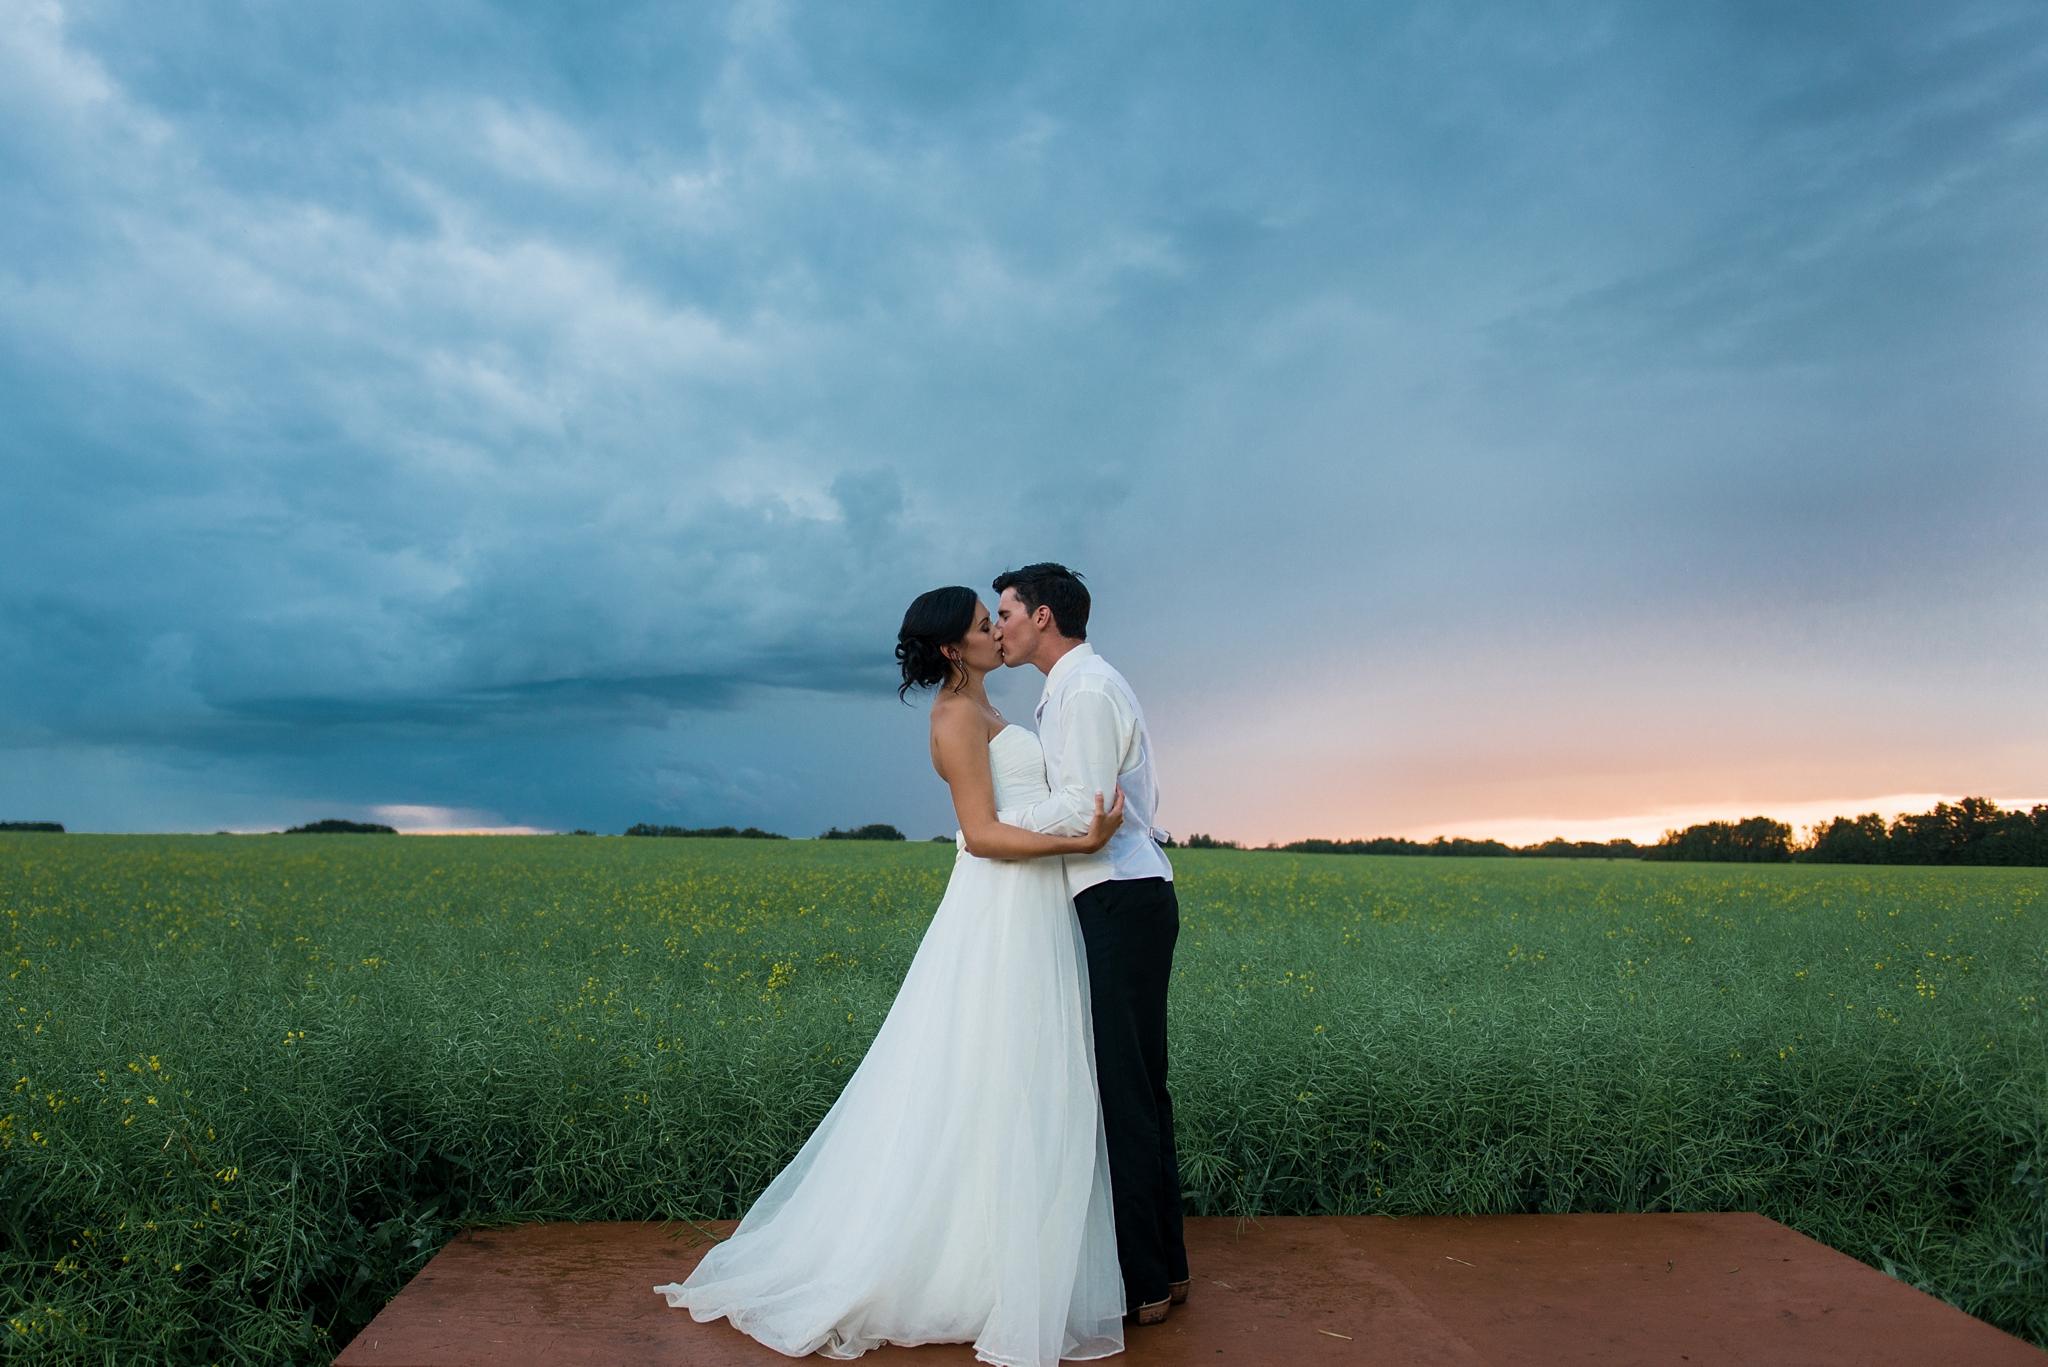 kaihla_tonai_intimate_wedding_elopement_photographer_0116